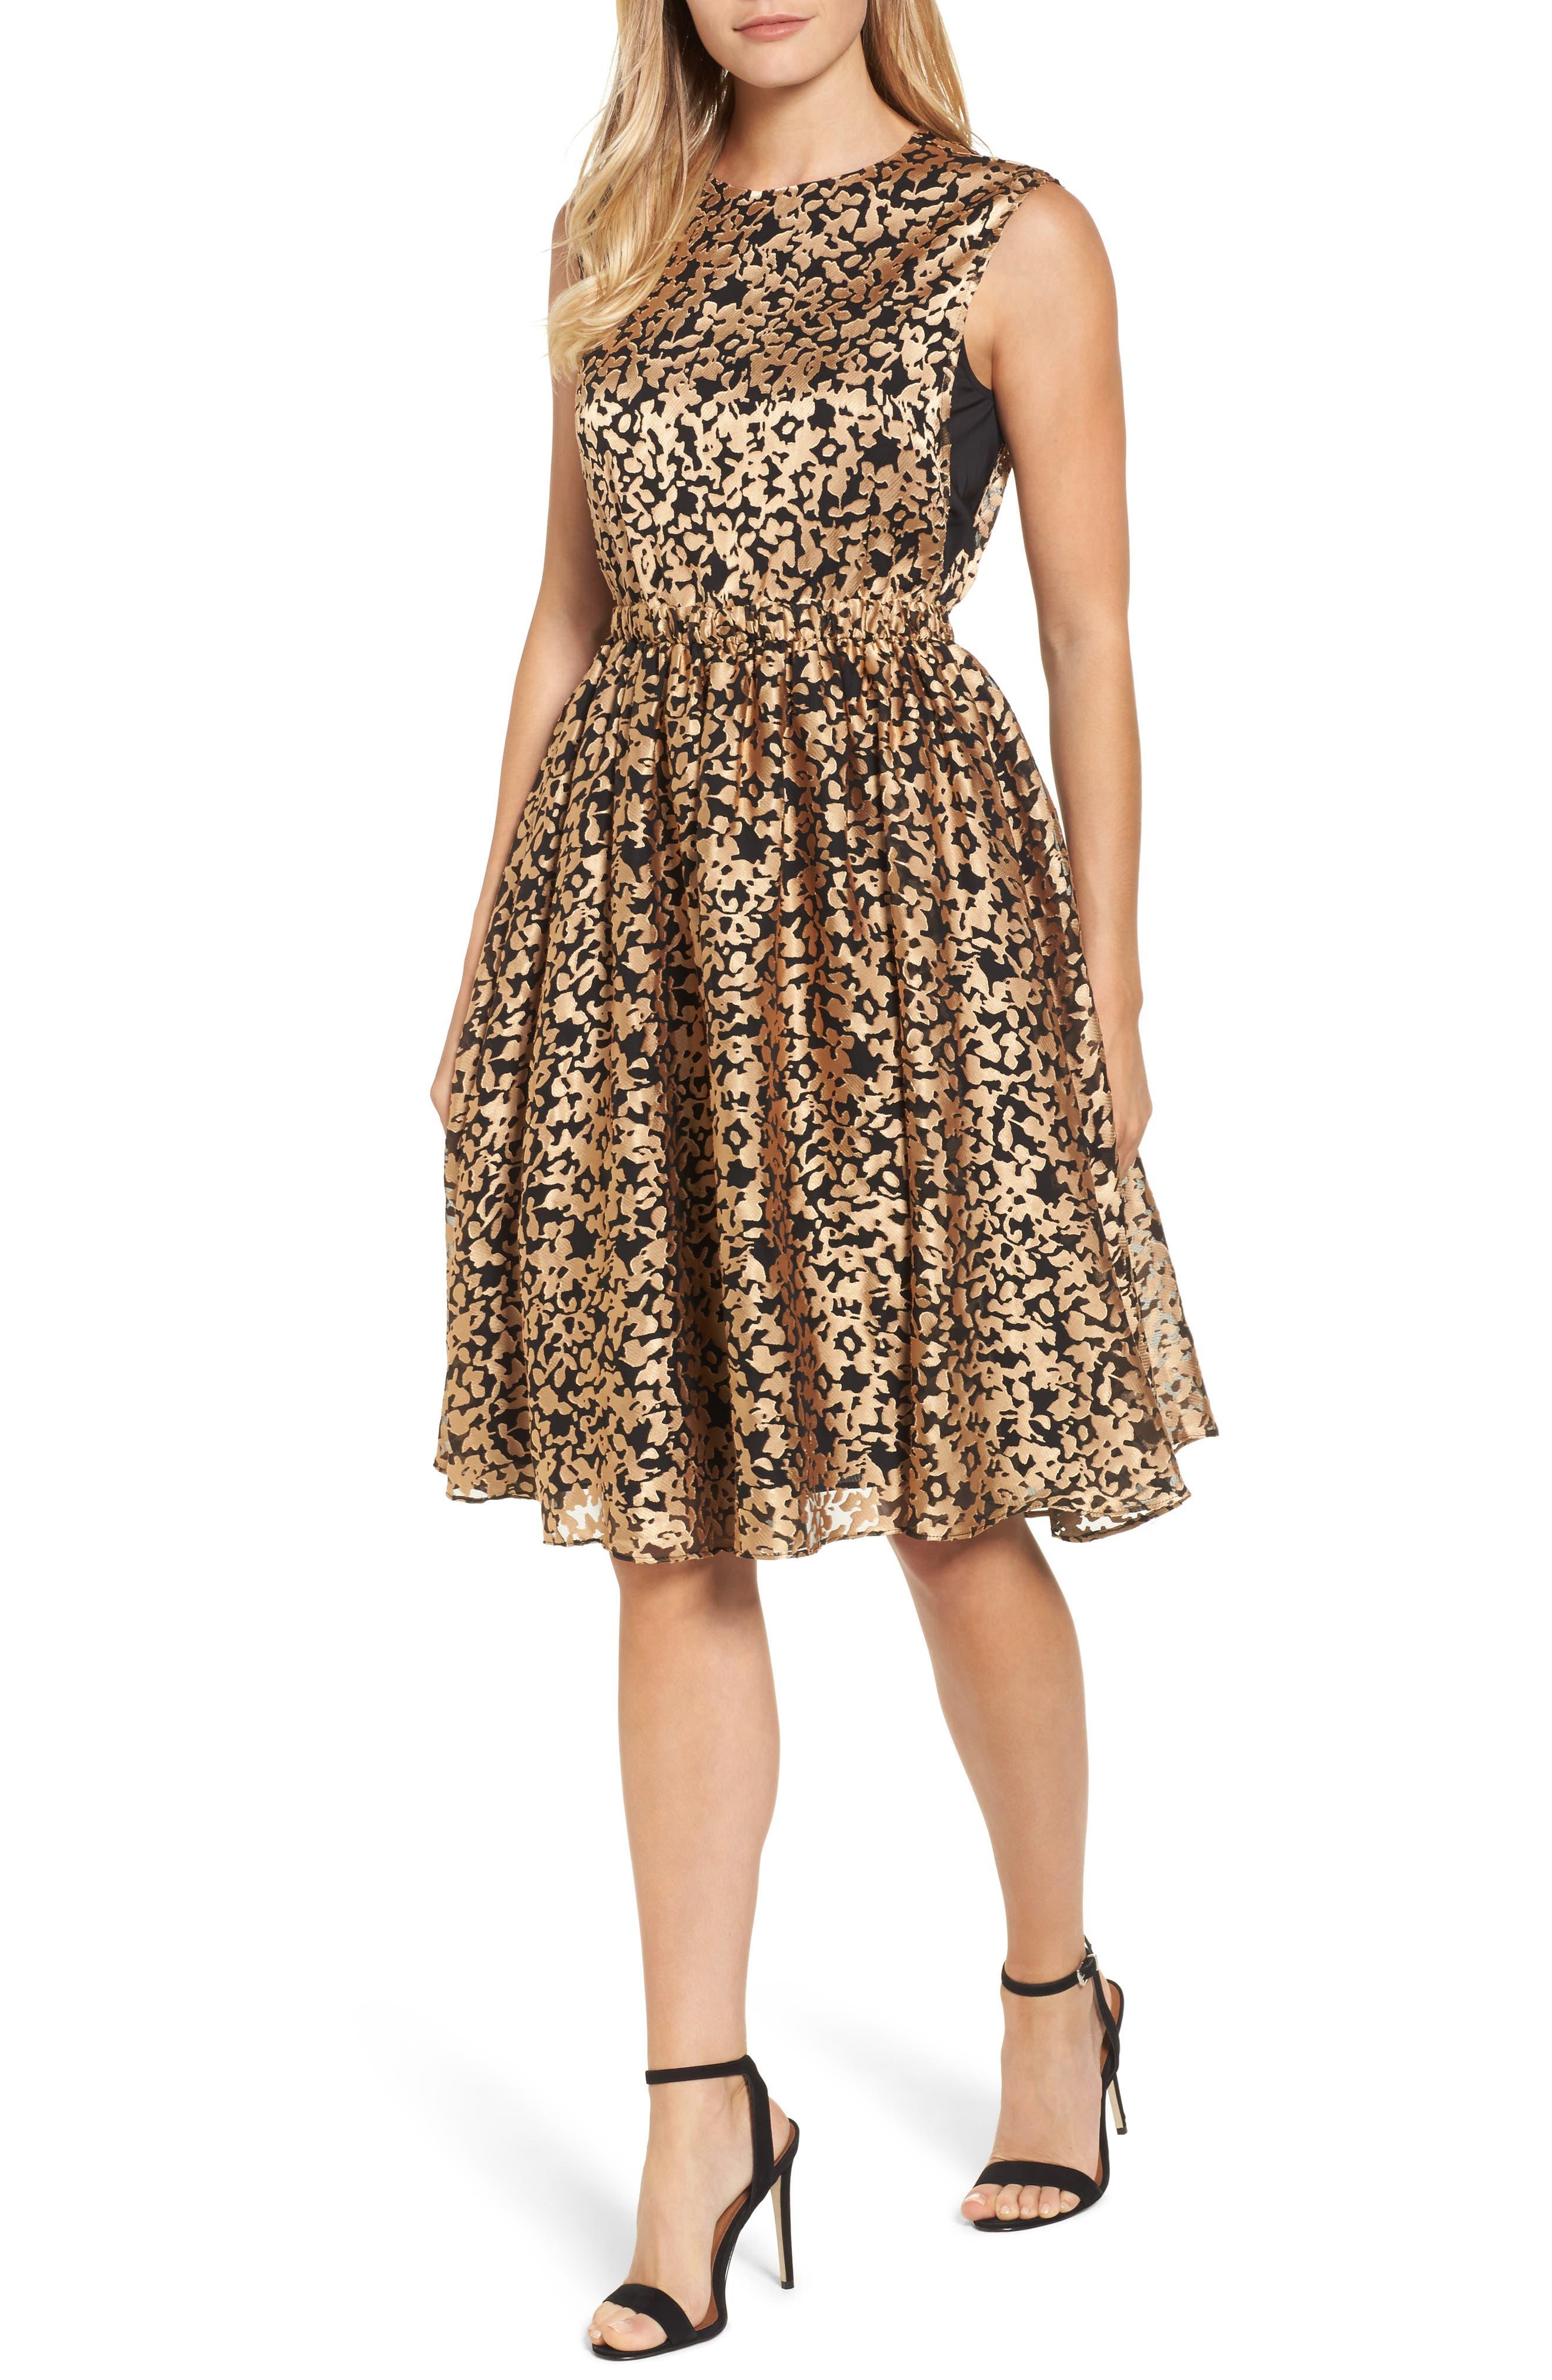 Kells Metallic Fit & Flare Dress,                             Main thumbnail 1, color,                             Gold/ Black